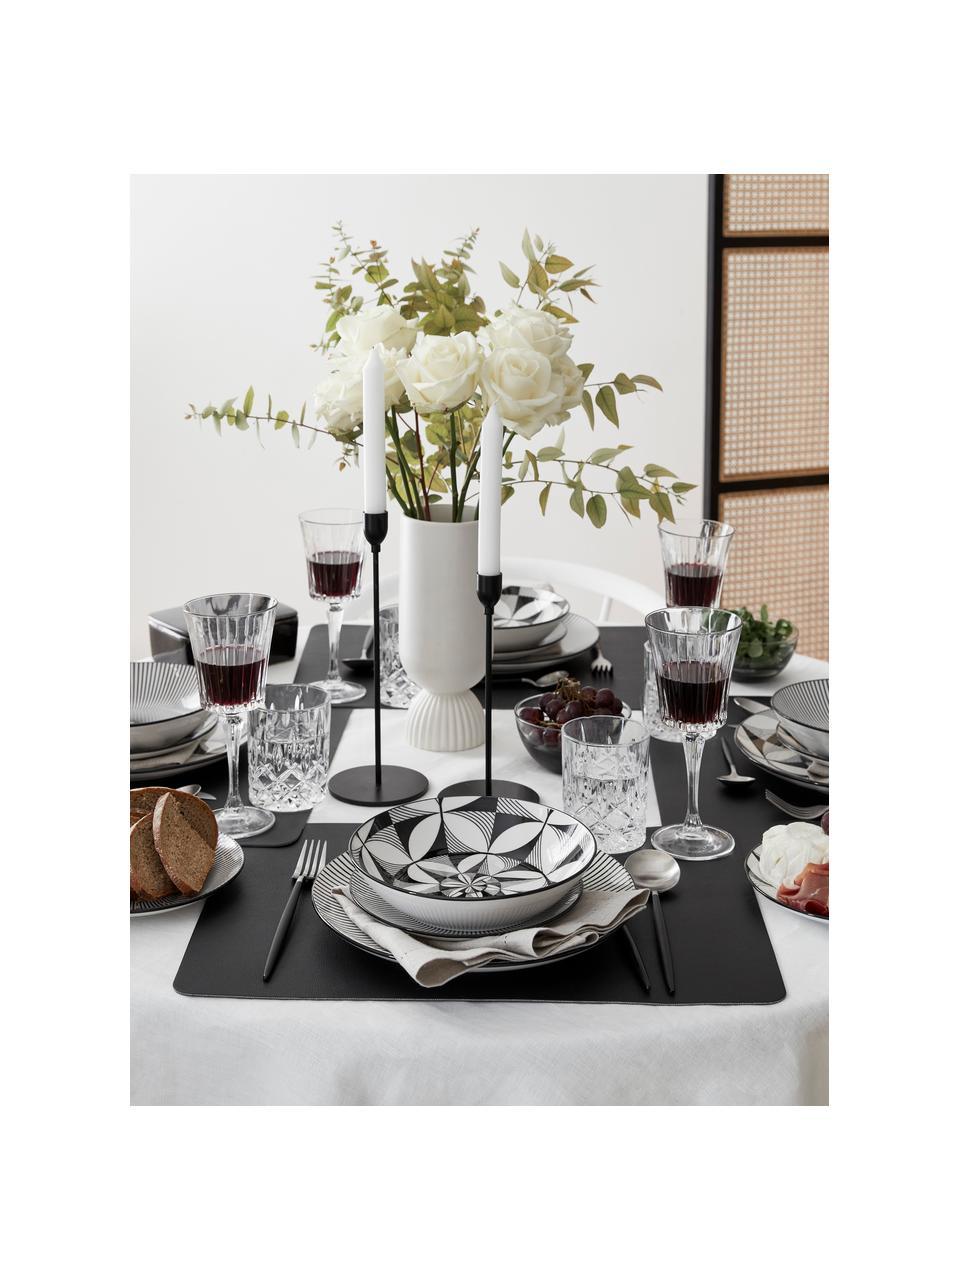 Kristall-Rotweingläser Timeless mit Rillenrelief, 6 Stück, Luxion-Kristallglas, Transparent, Ø 9 x H 21 cm